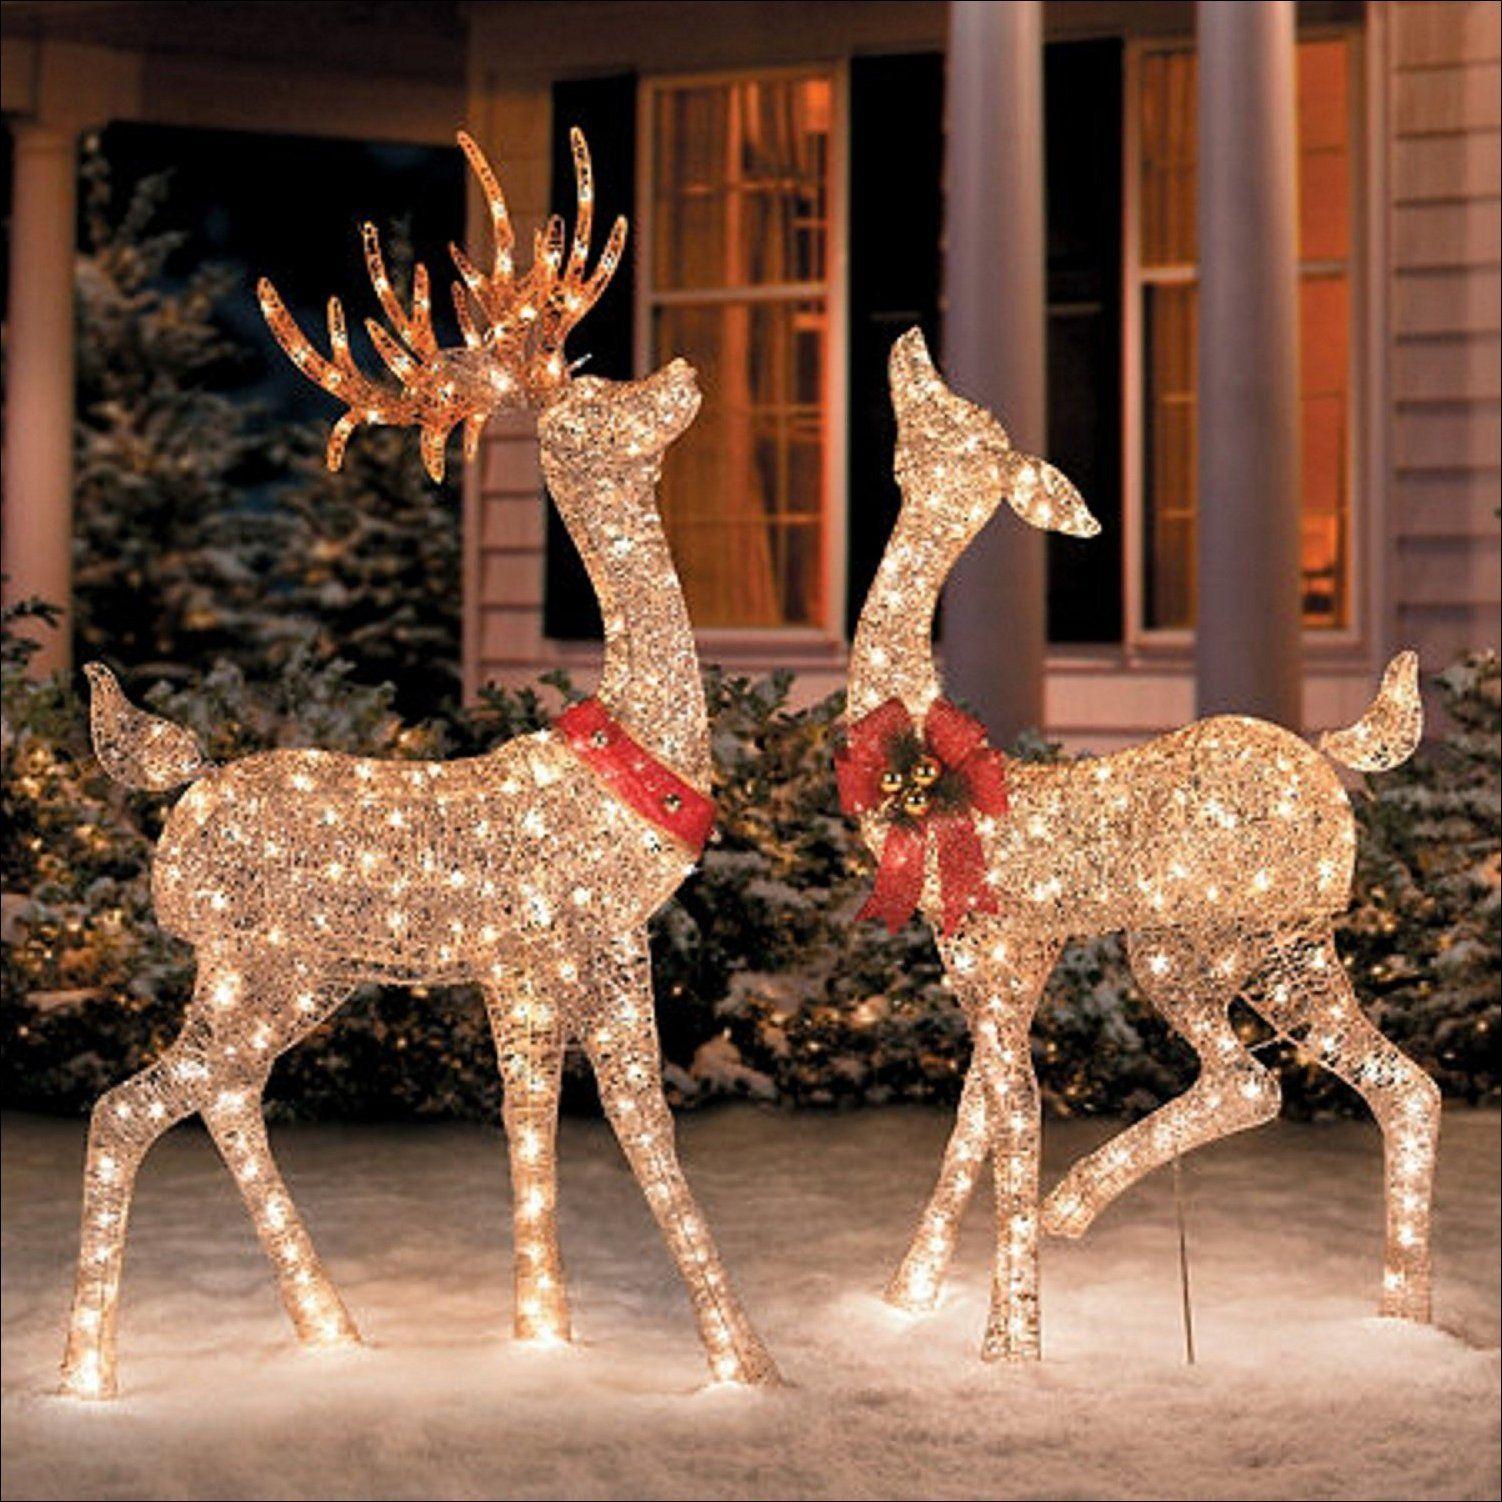 52 Amazing Diy Outdoor Christmas Decorations Christmas Reindeer Decorations Christmas Deer Decorations Outdoor Christmas